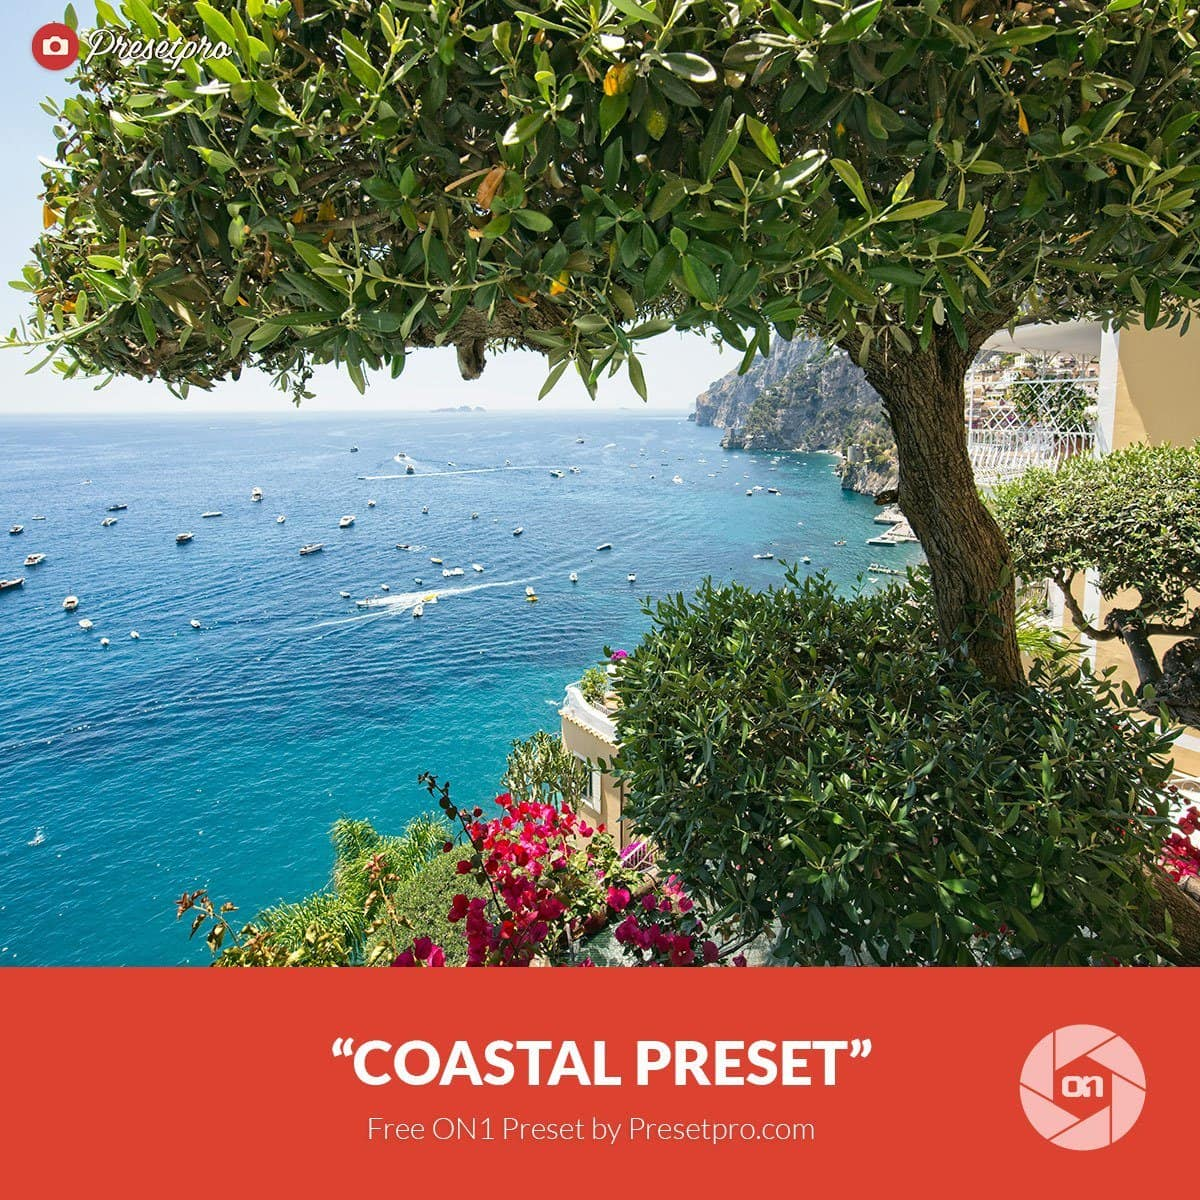 Free-On1-Preset-Coastal-Presetpro.com